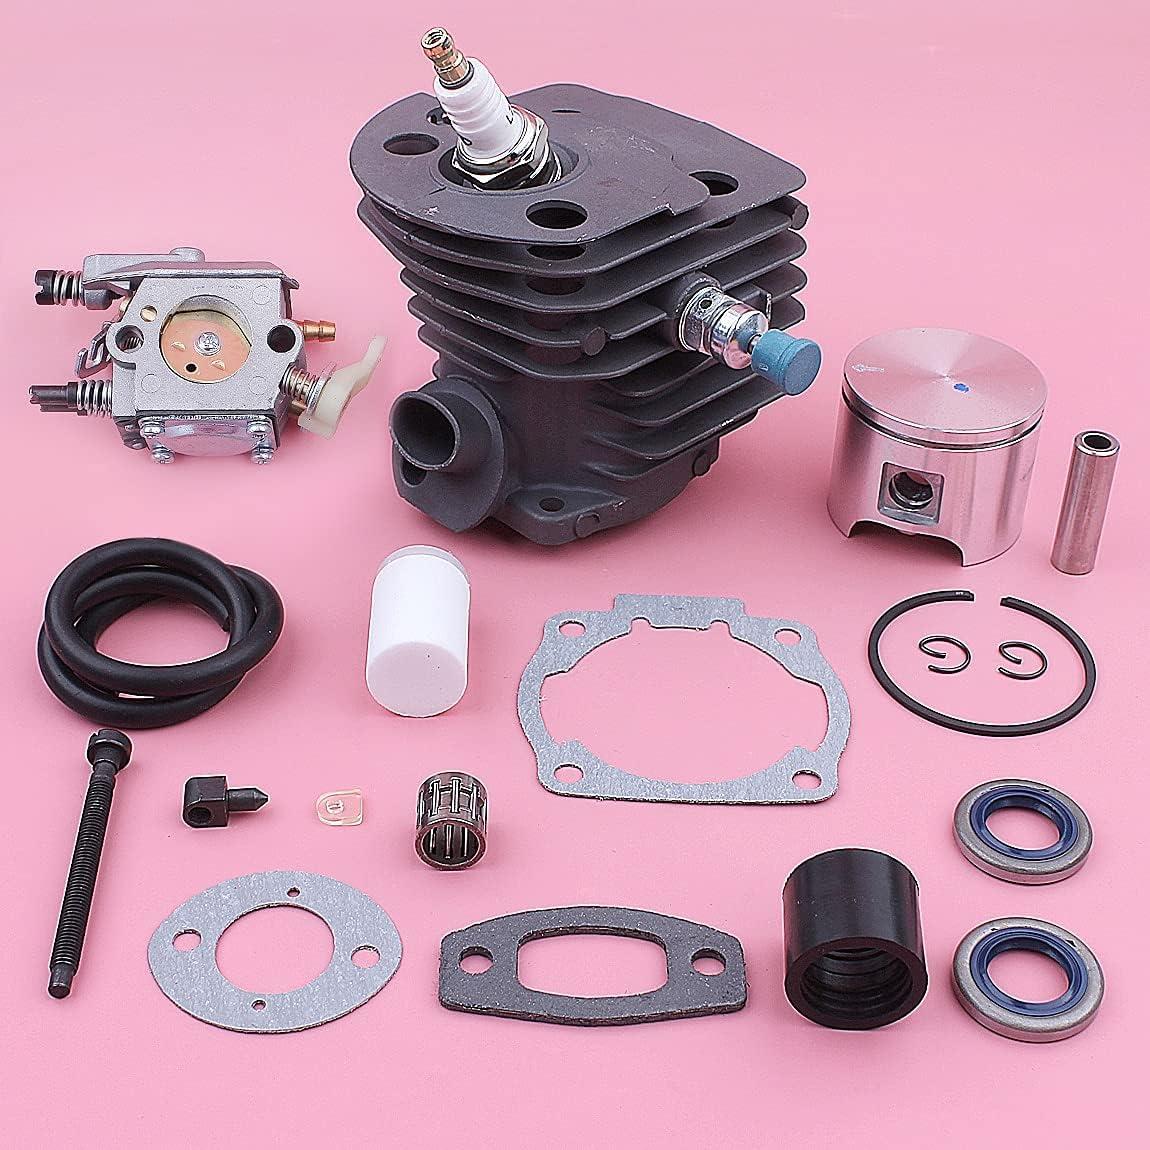 KENZAVO NEW before selling ☆ Cylinder Piston Carburetor For Decompres 55 Husqvarna 51 New item